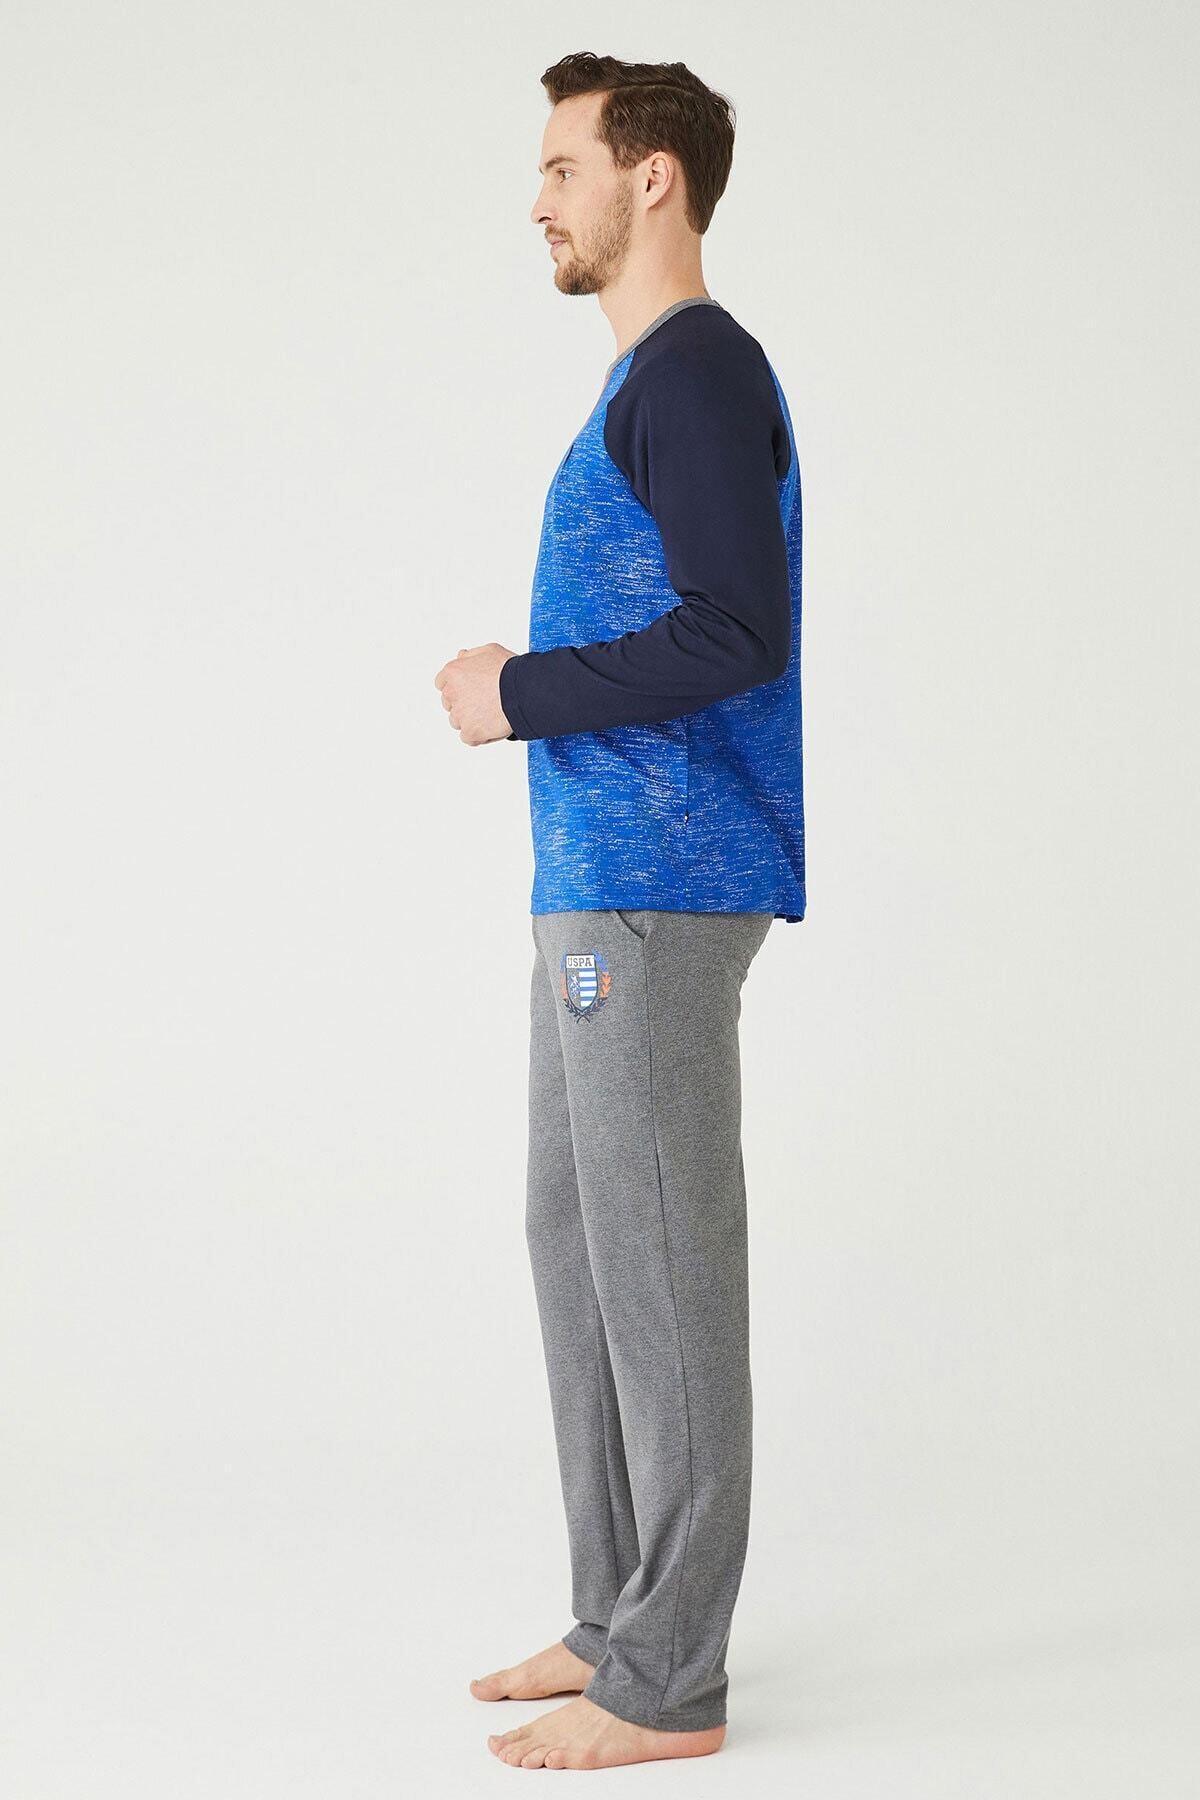 U.S POLO Erkek Sax Yuvarlak Yaka Pijama Takım 2